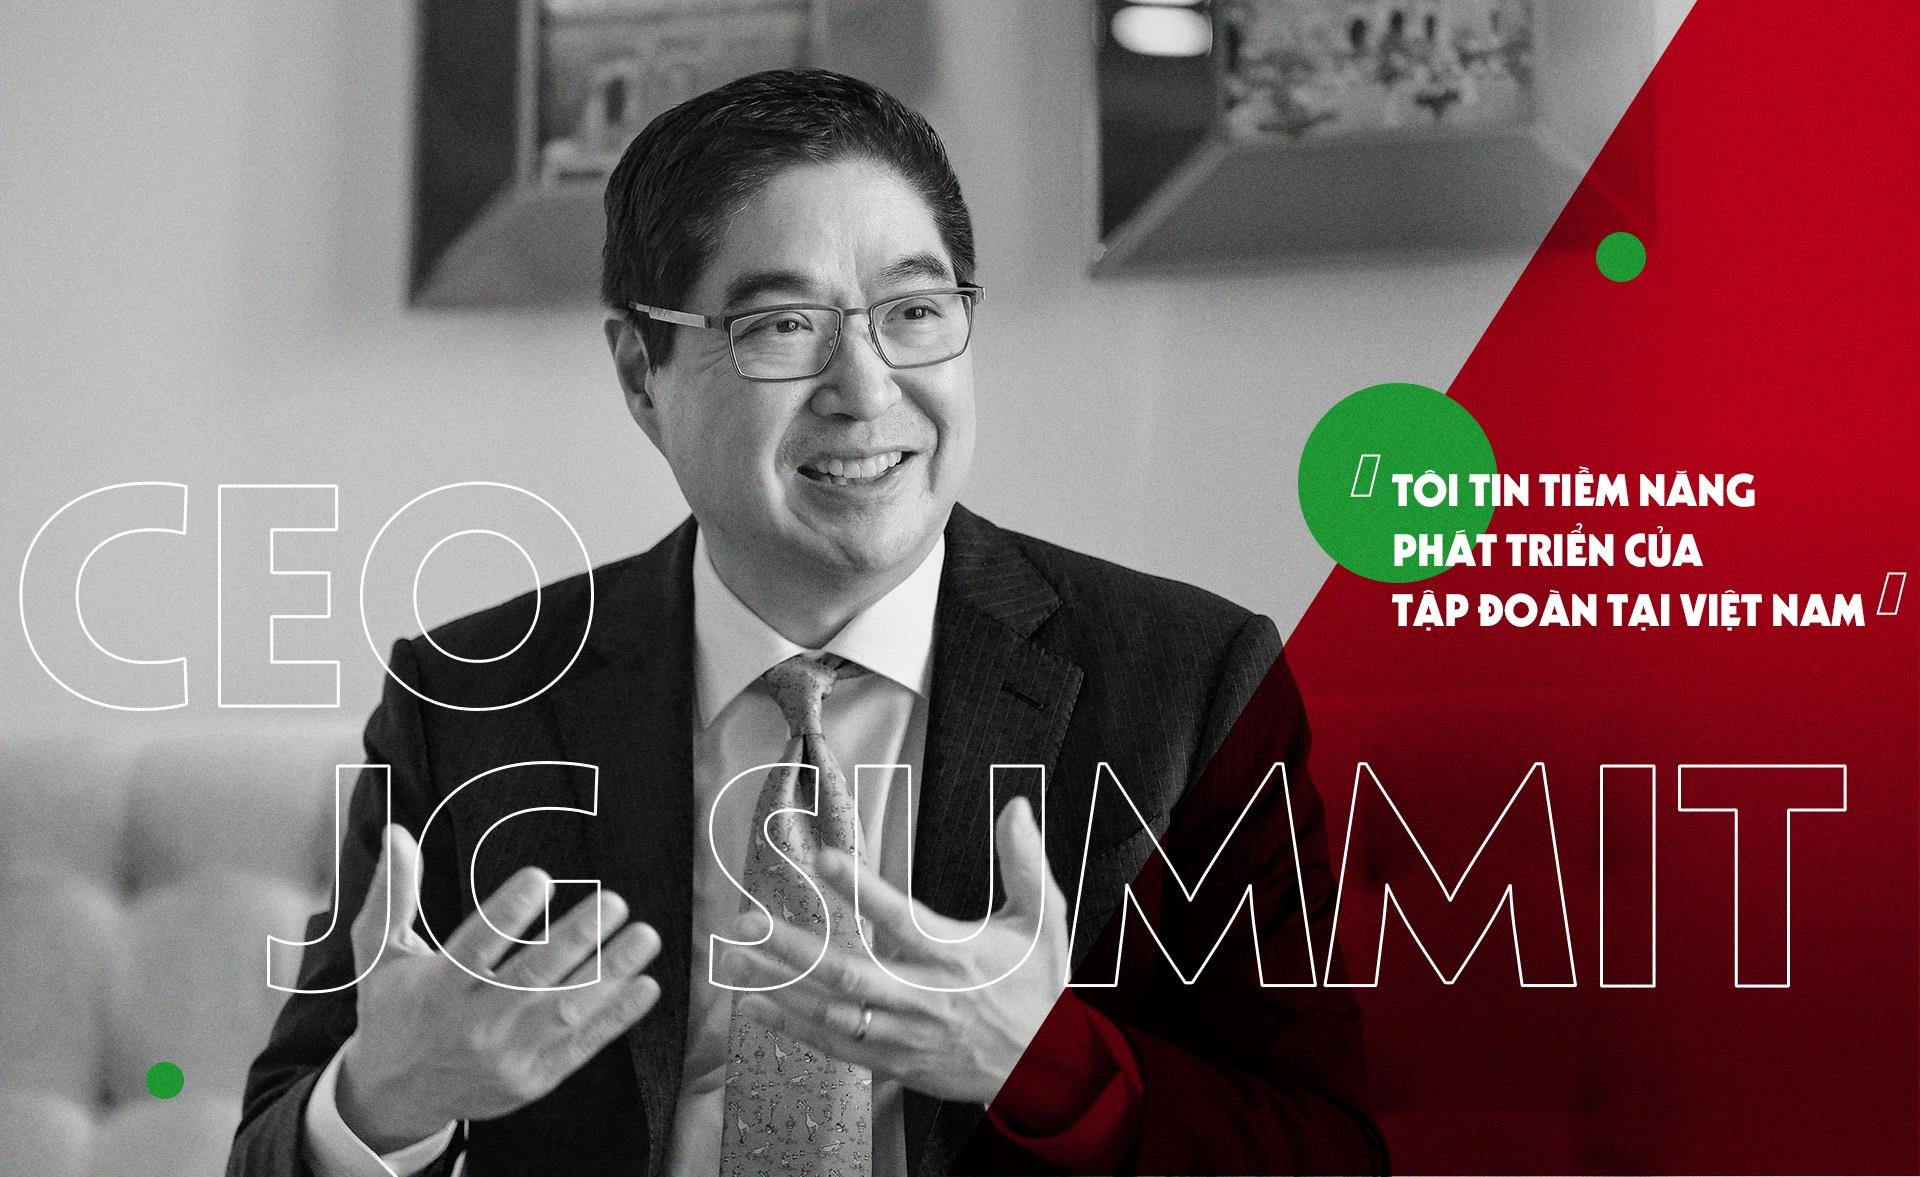 CEO JG Summit: 'Toi tin o tiem nang phat trien cua tap doan tai VN' hinh anh 2